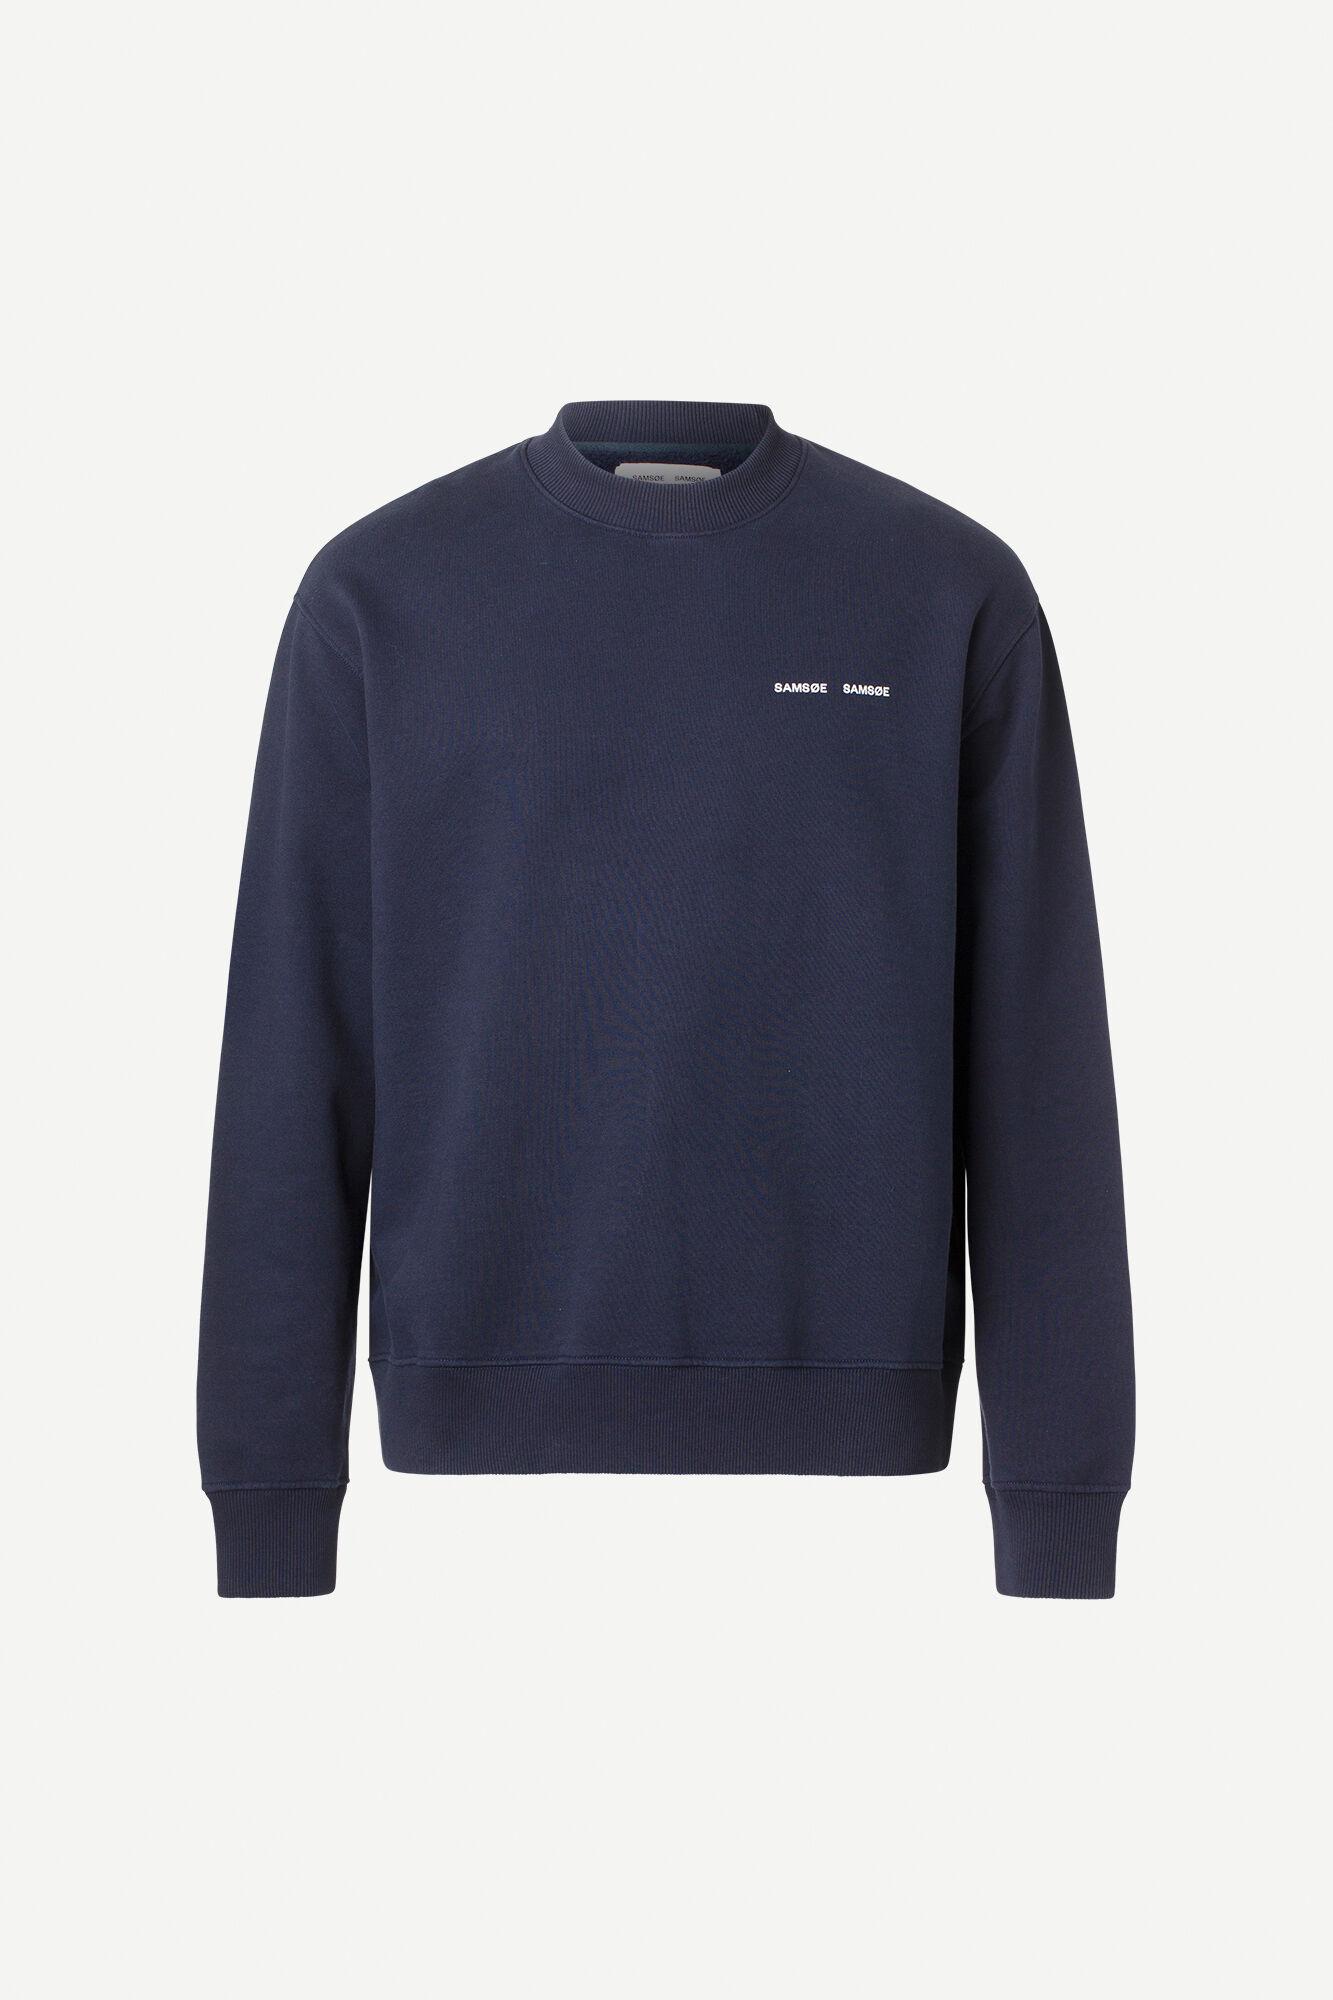 Samsøe & Samsøe Norsbro sweatshirt